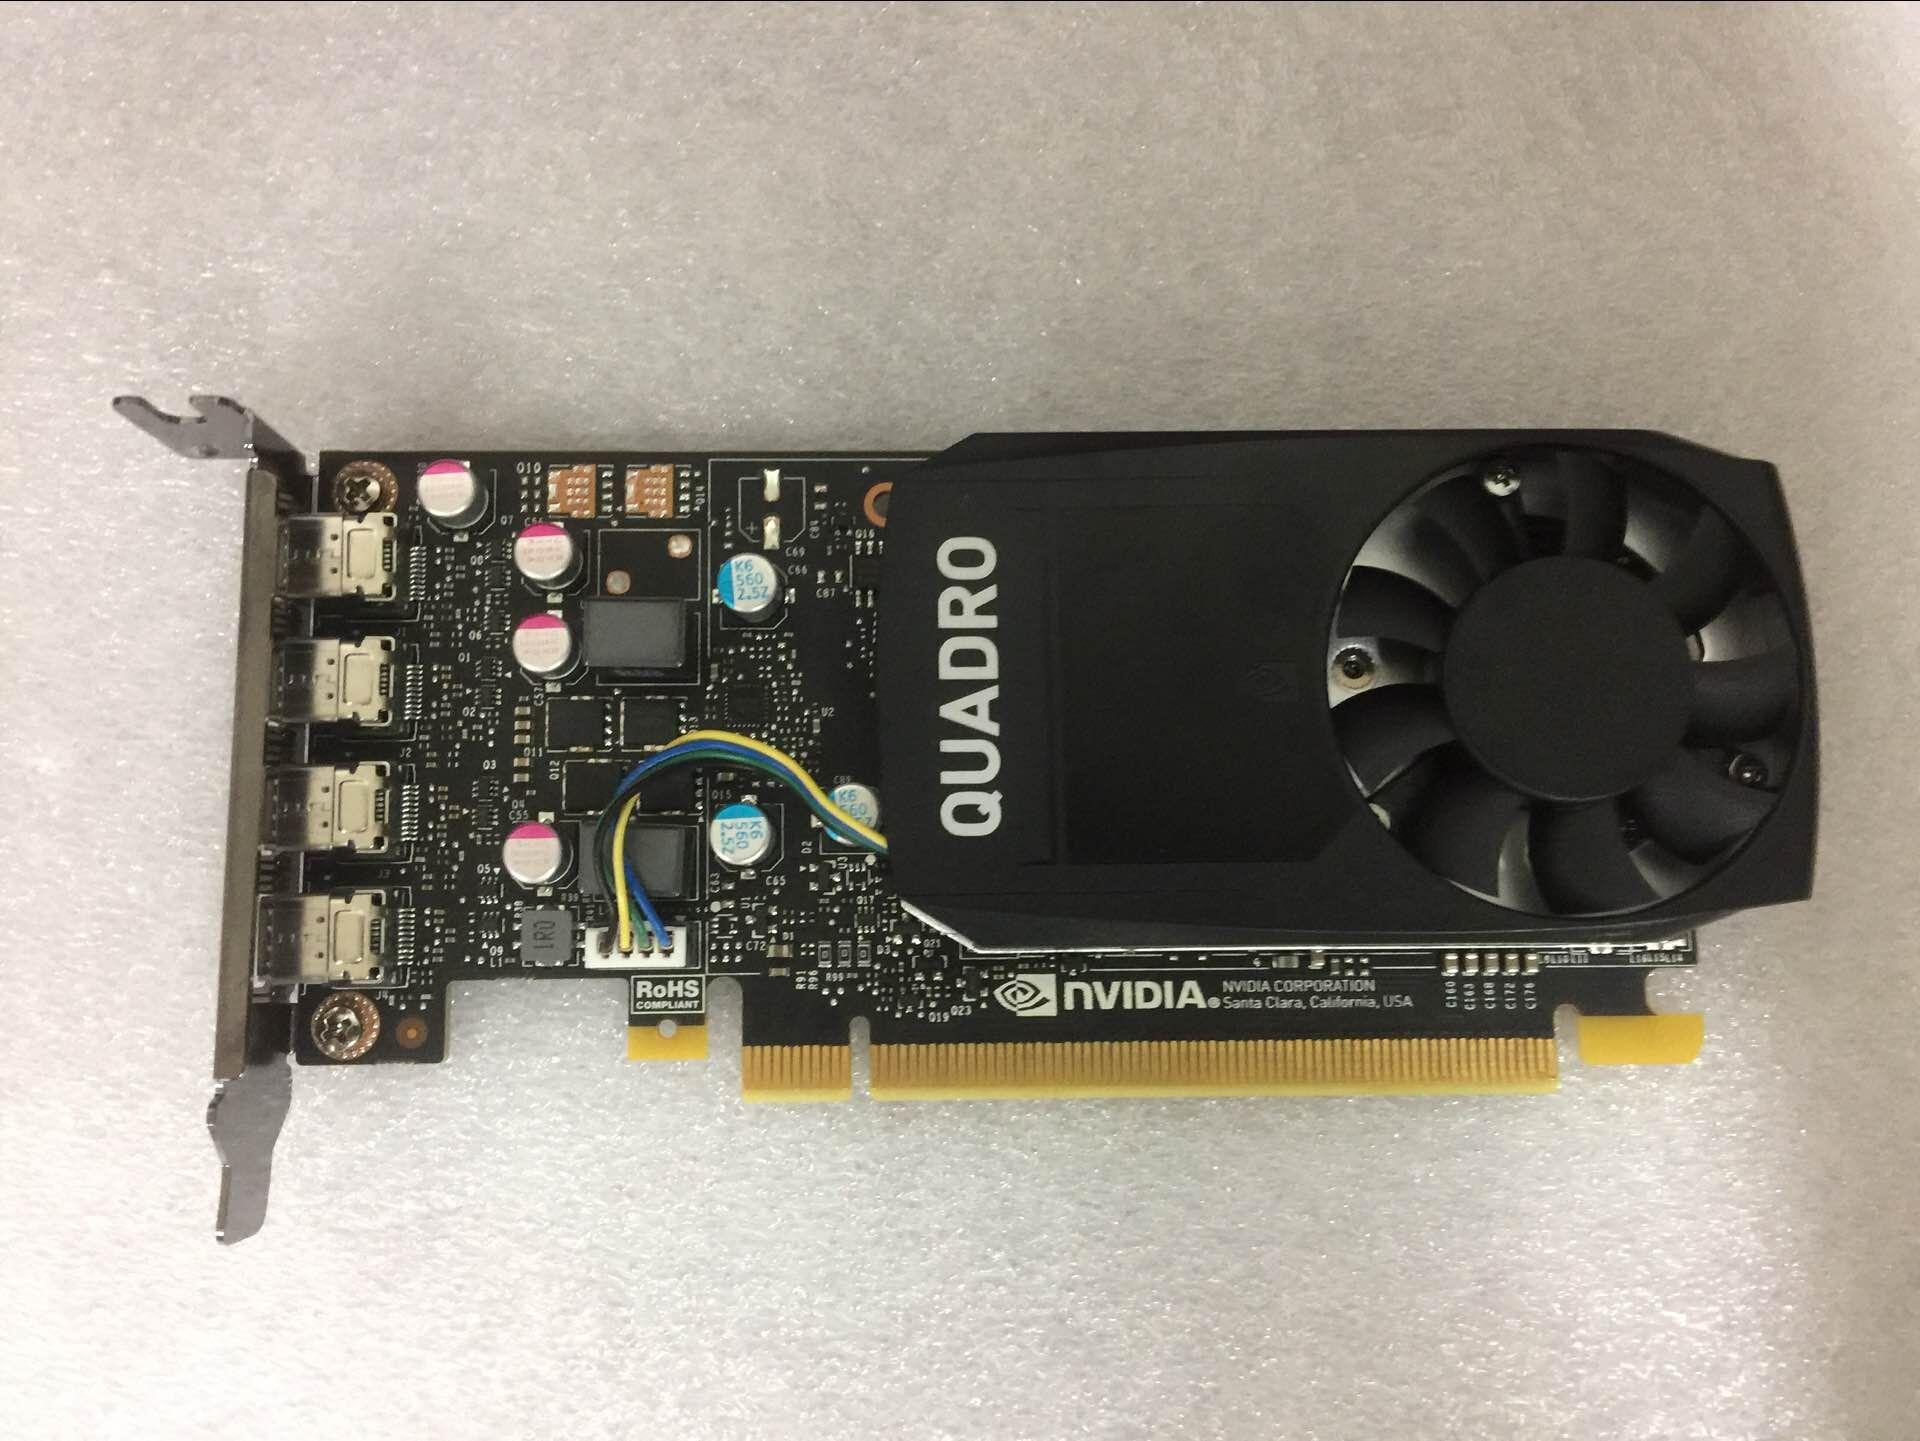 Quadro P600 2G Professional Graphics Card, Three-year Warranty